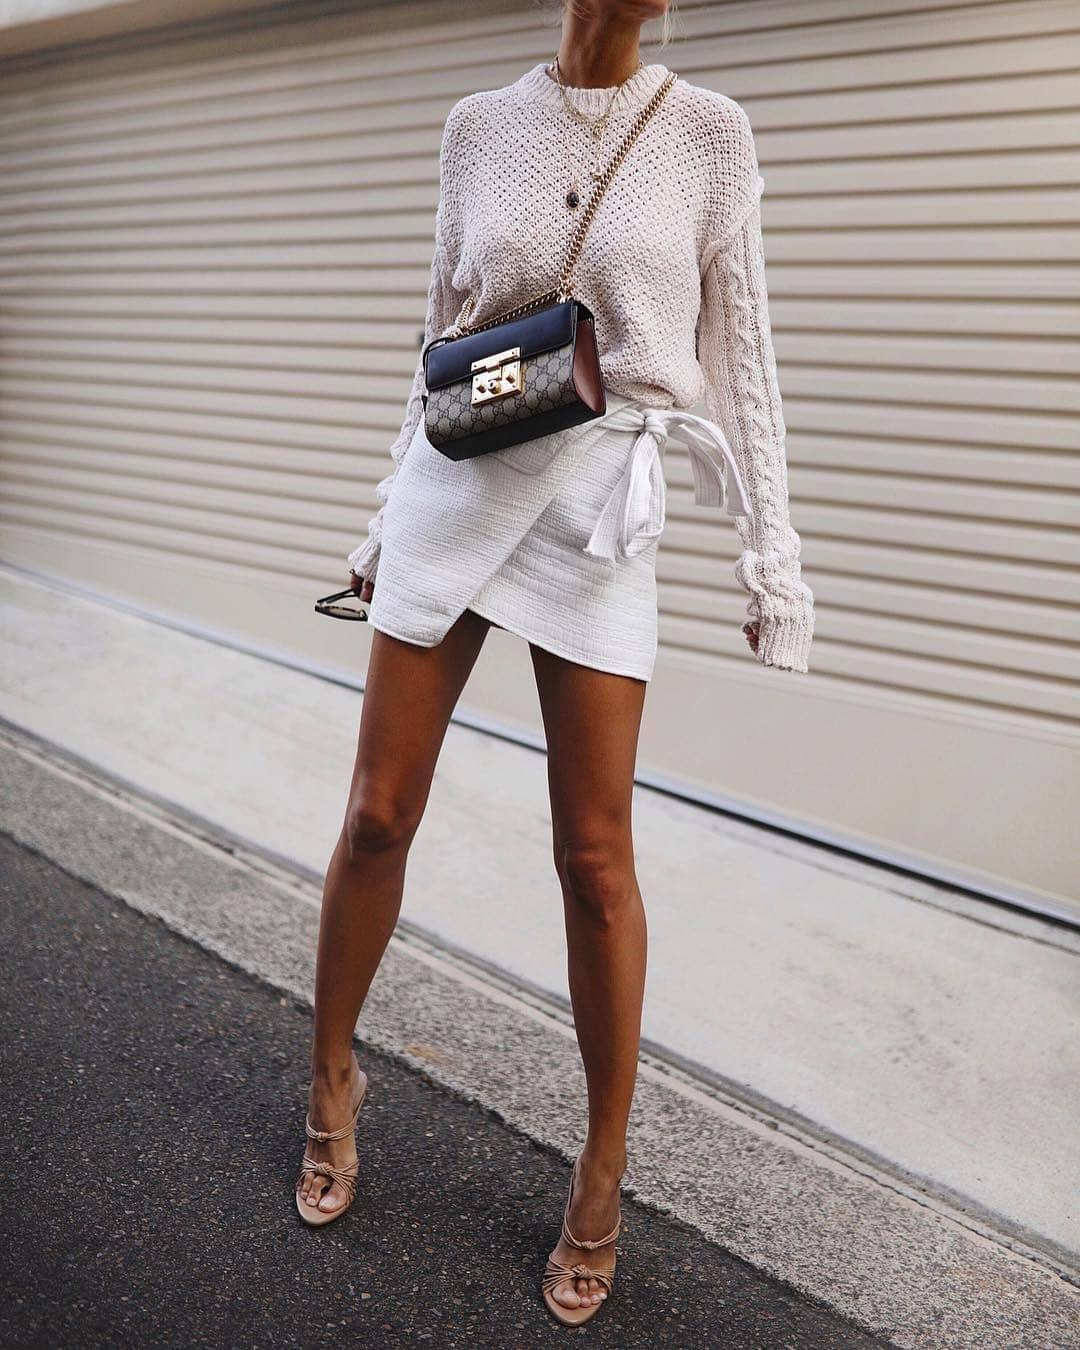 fashion____daily____2_4_2019_1_17_34_697.jpg